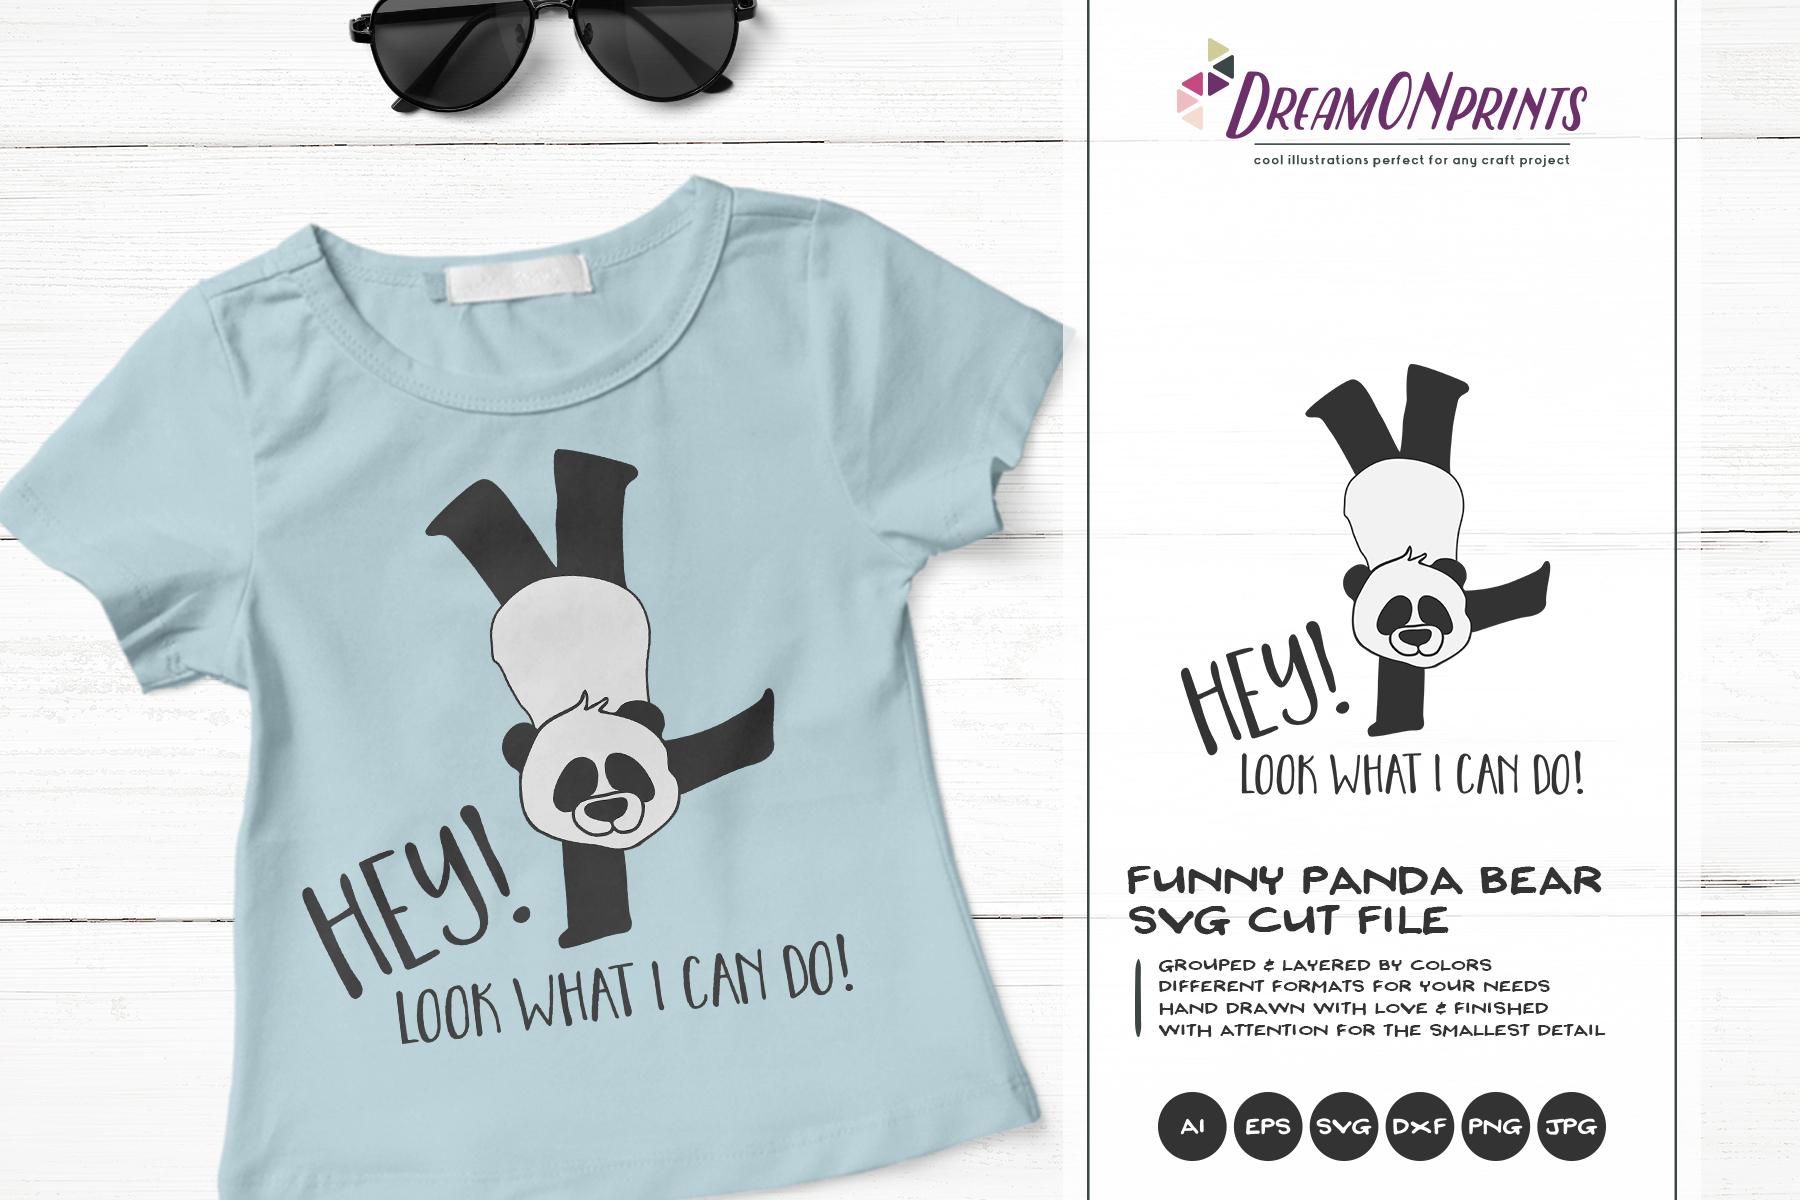 Funny Panda   Panda Bear SVG   Yoga Illustration example image 1